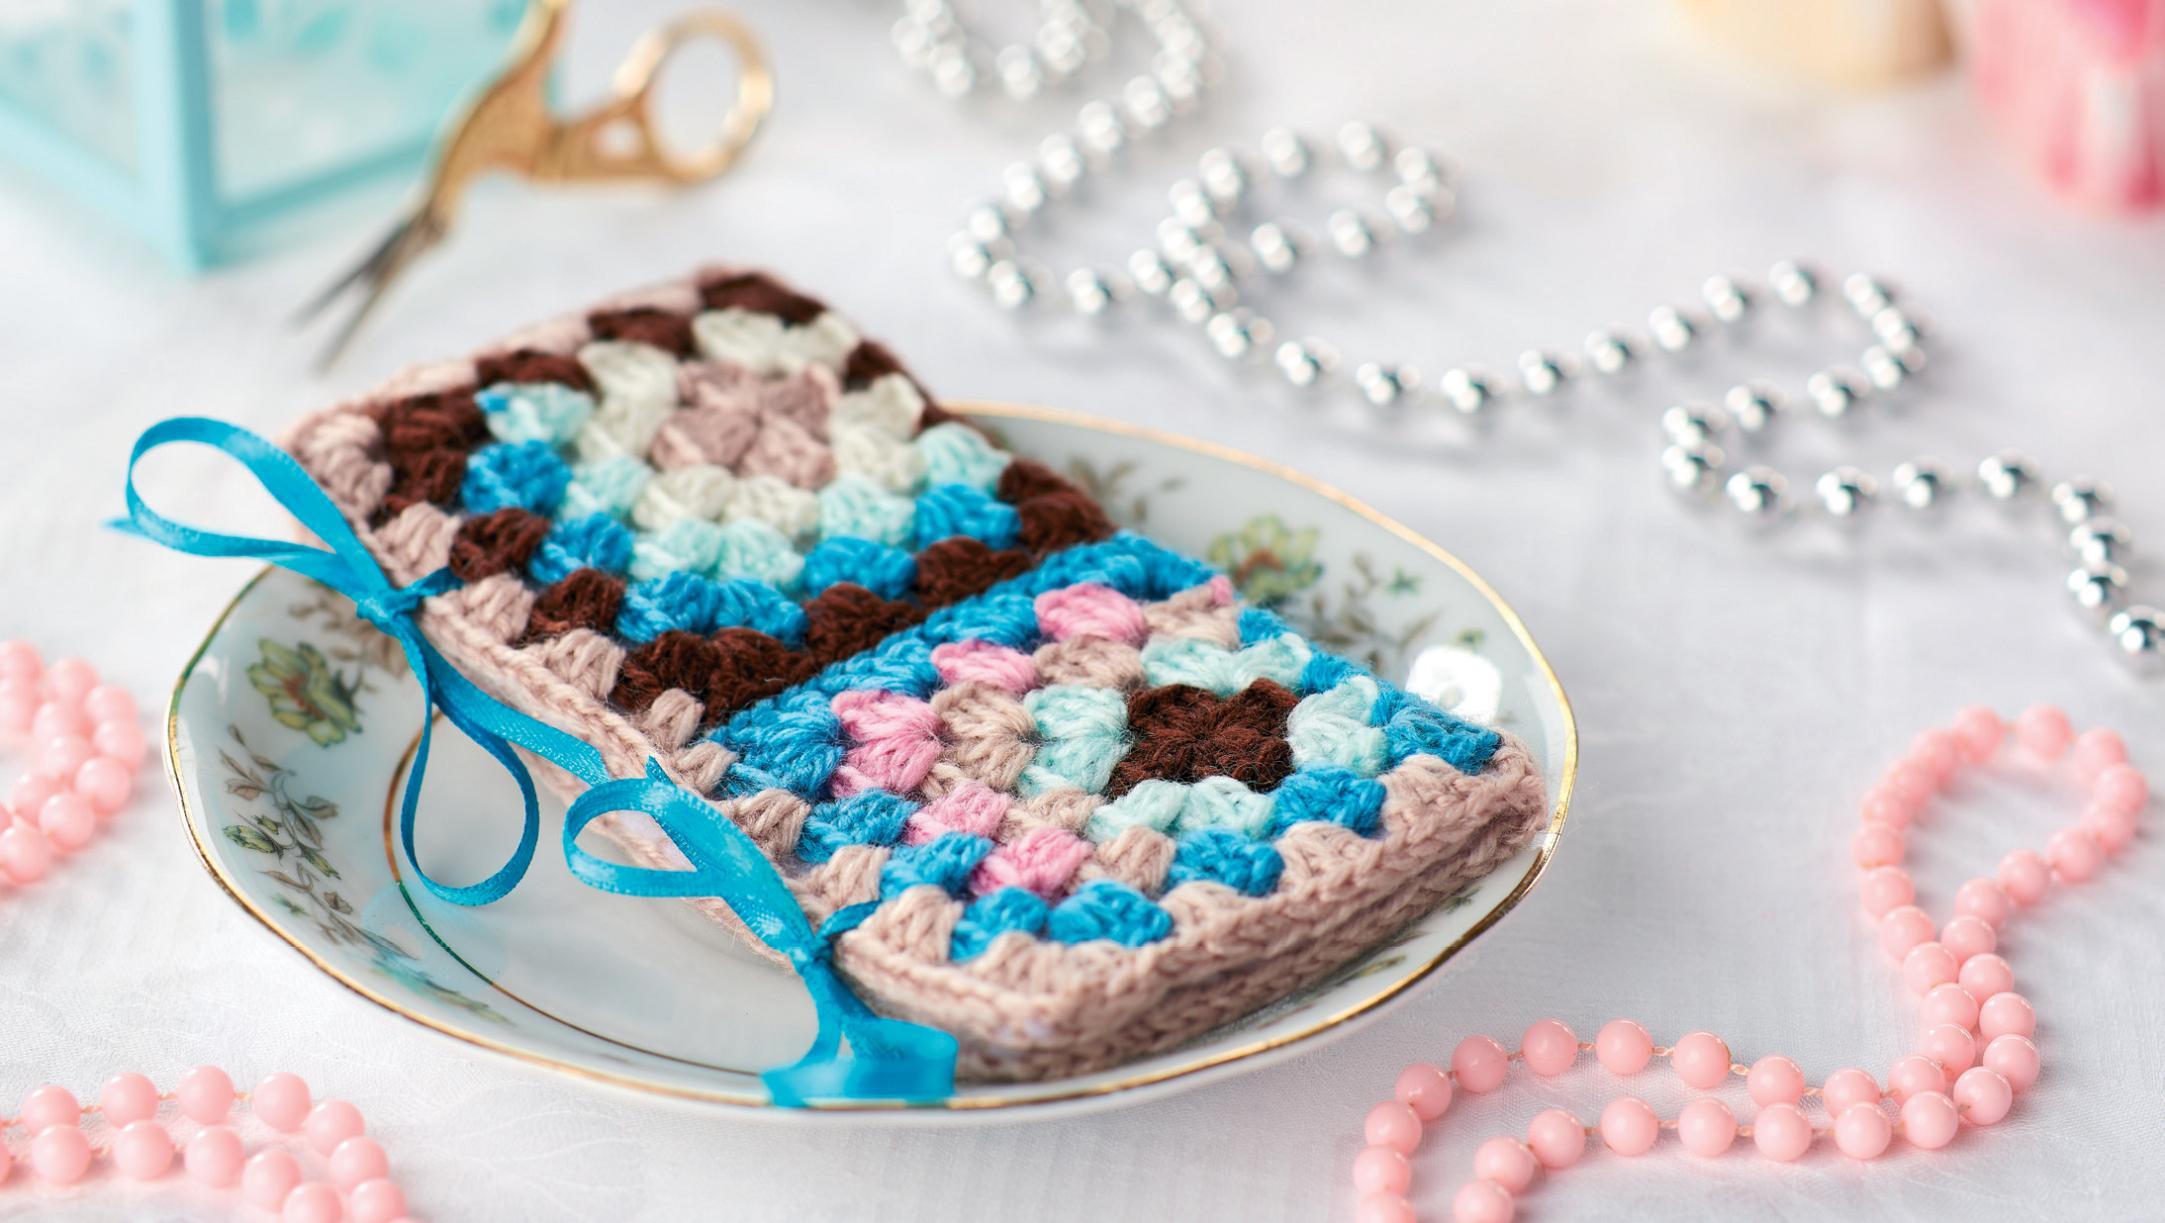 Crochet Sewing Accessories Crochet Pattern